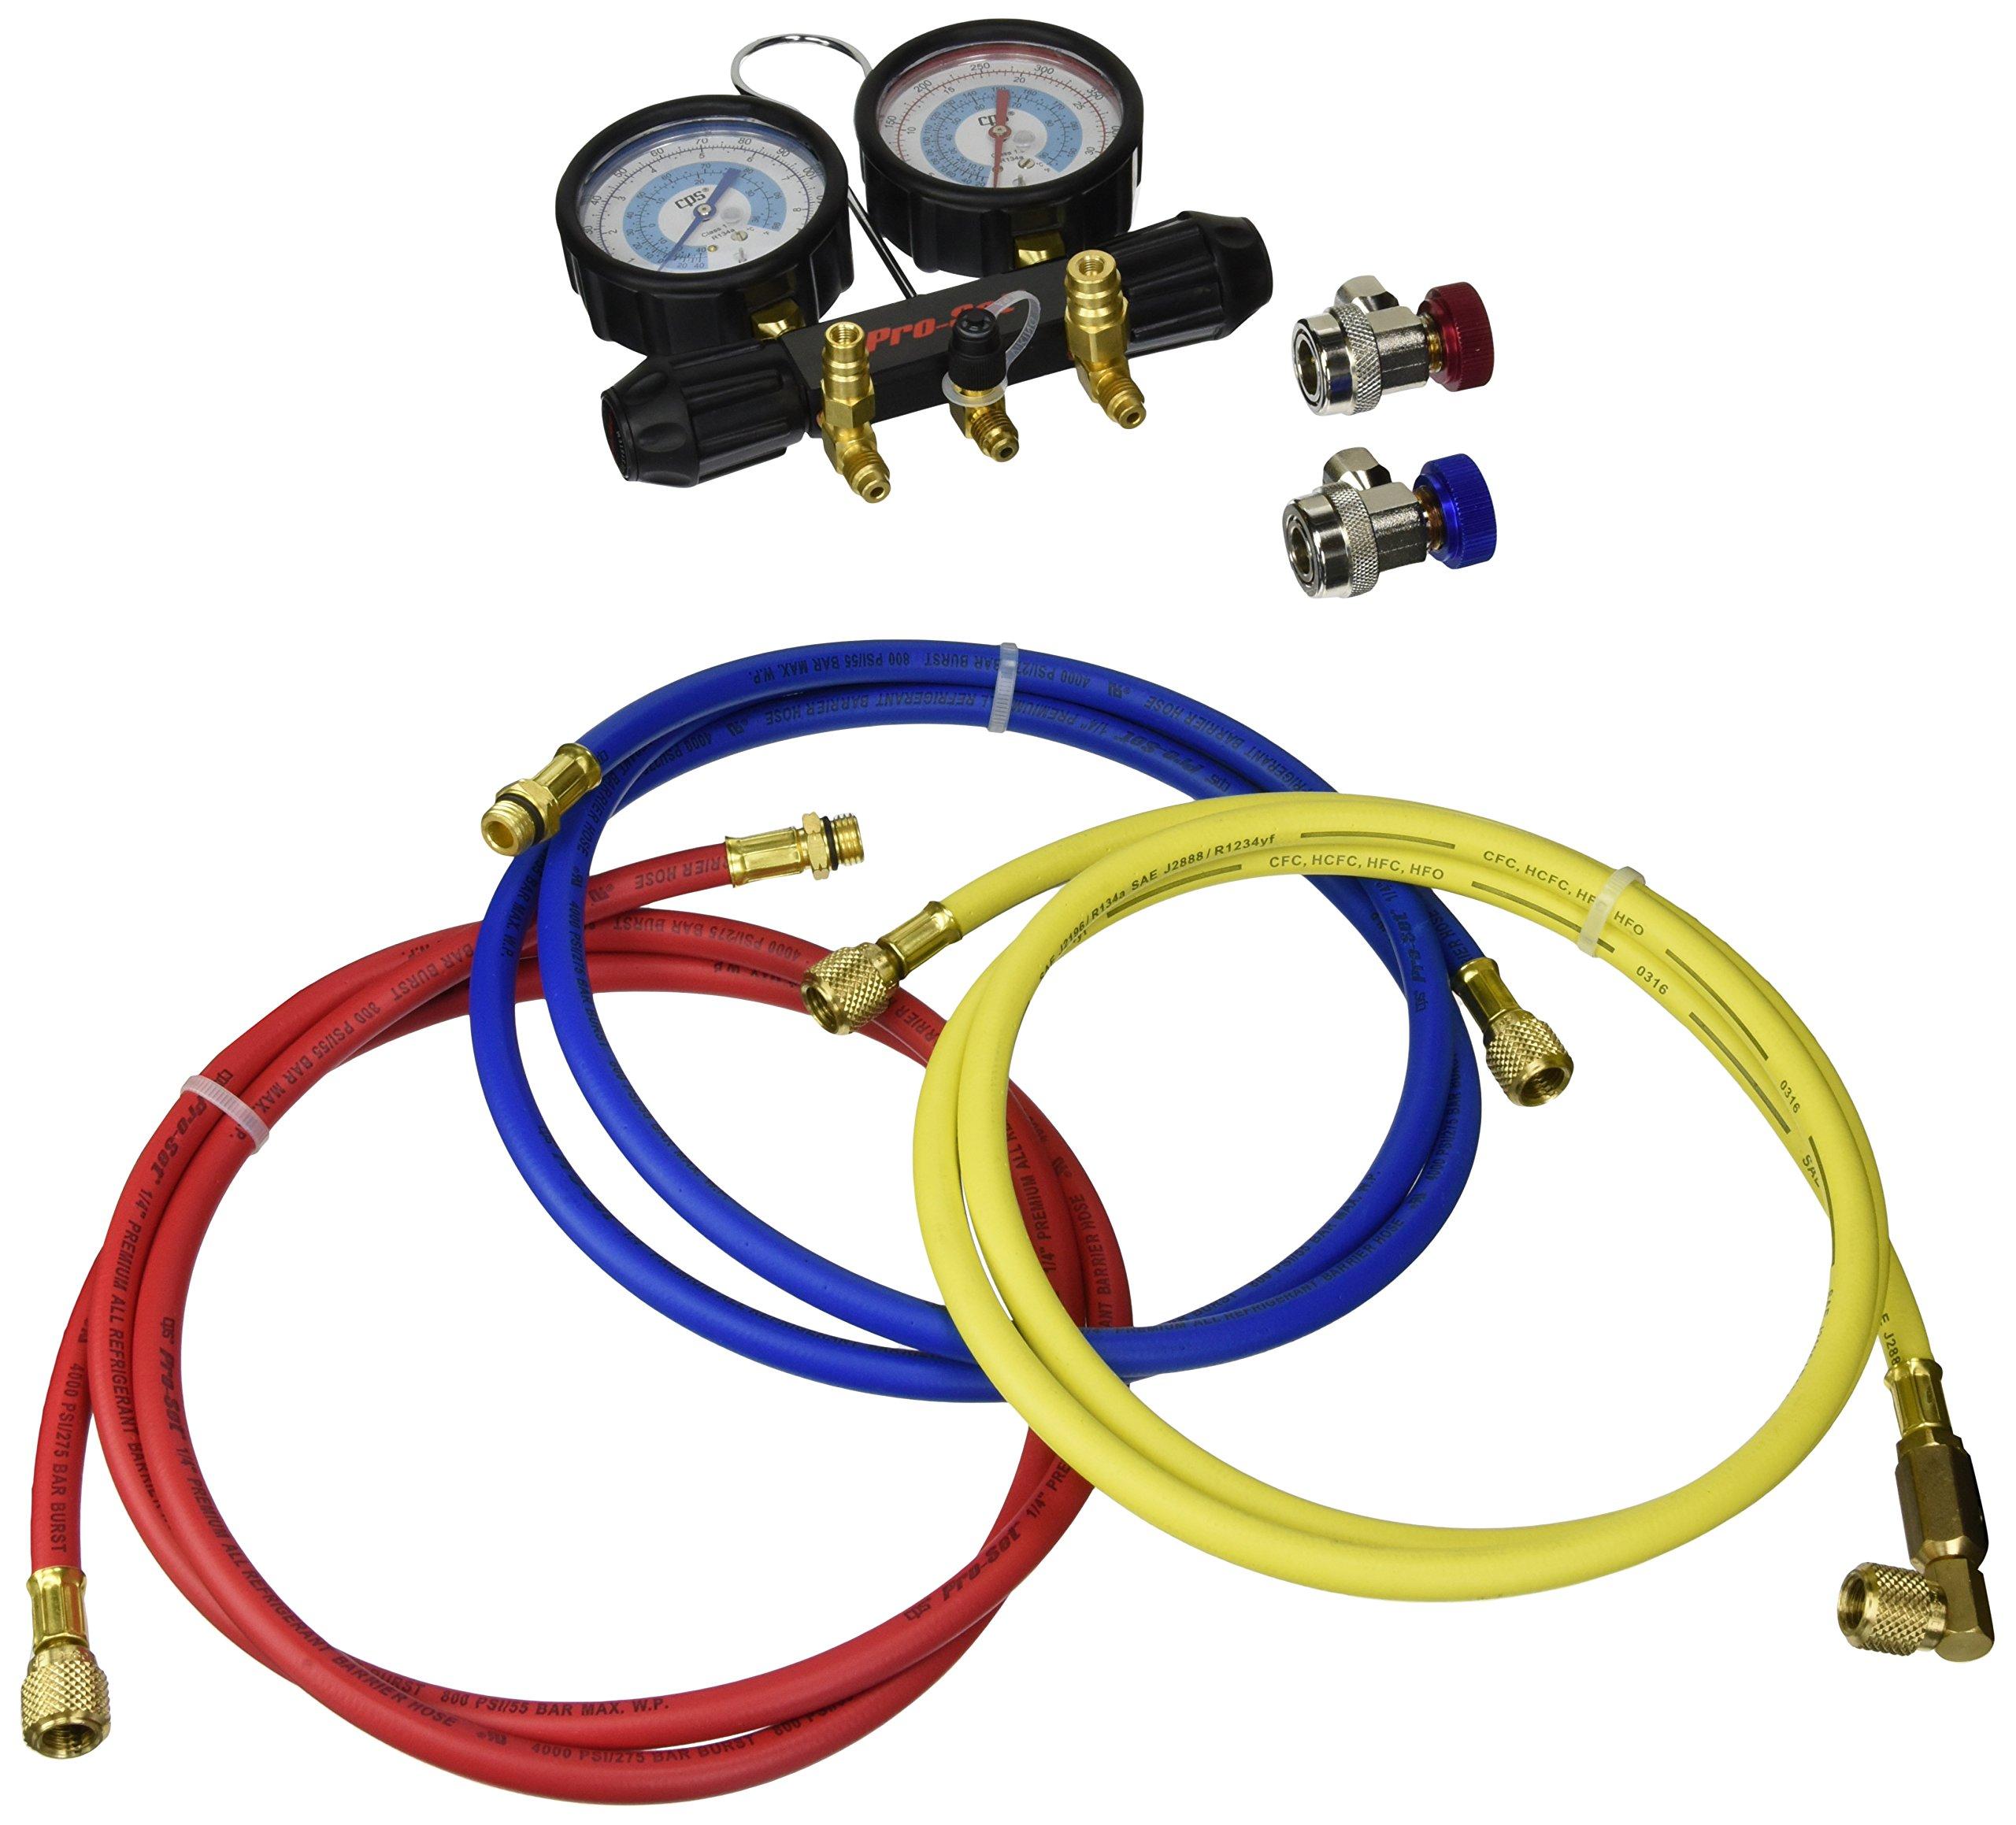 CPS Products MT7I7A6Q A/C Manifold Gauge Set